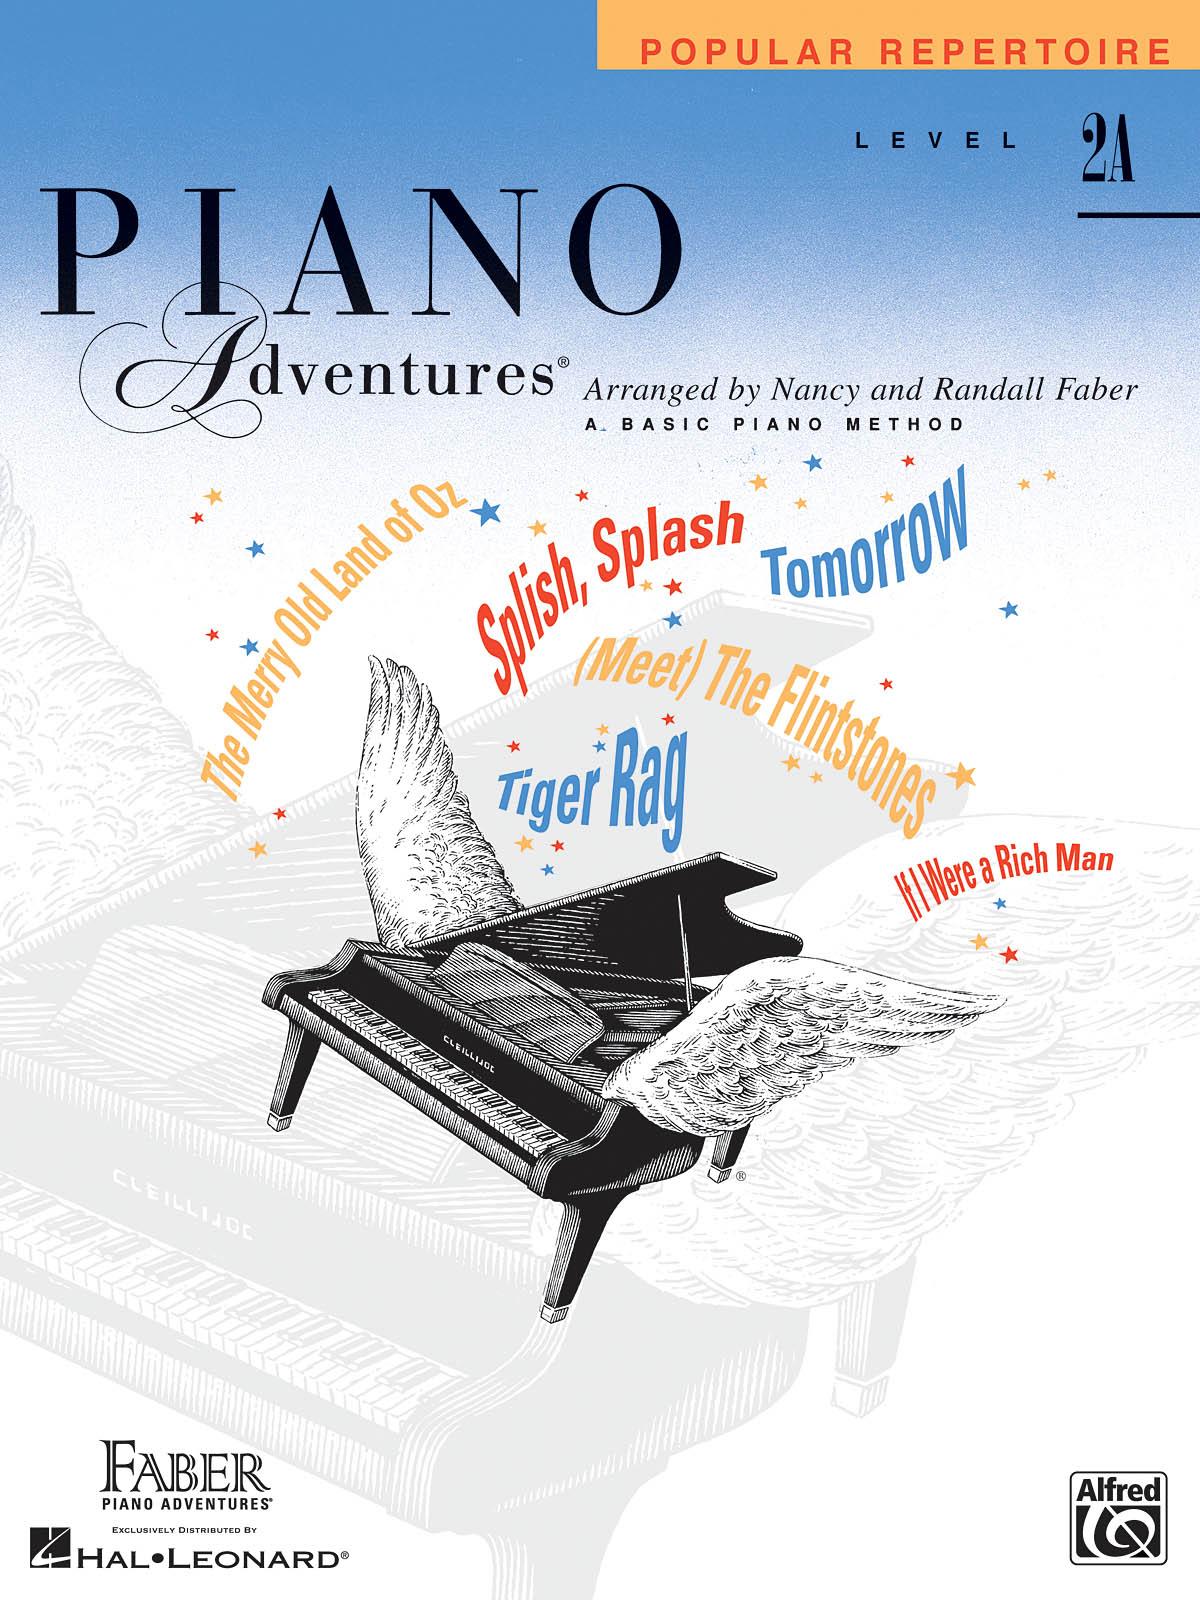 Faber Piano Adventures, Popular Repertoire, Level 2A